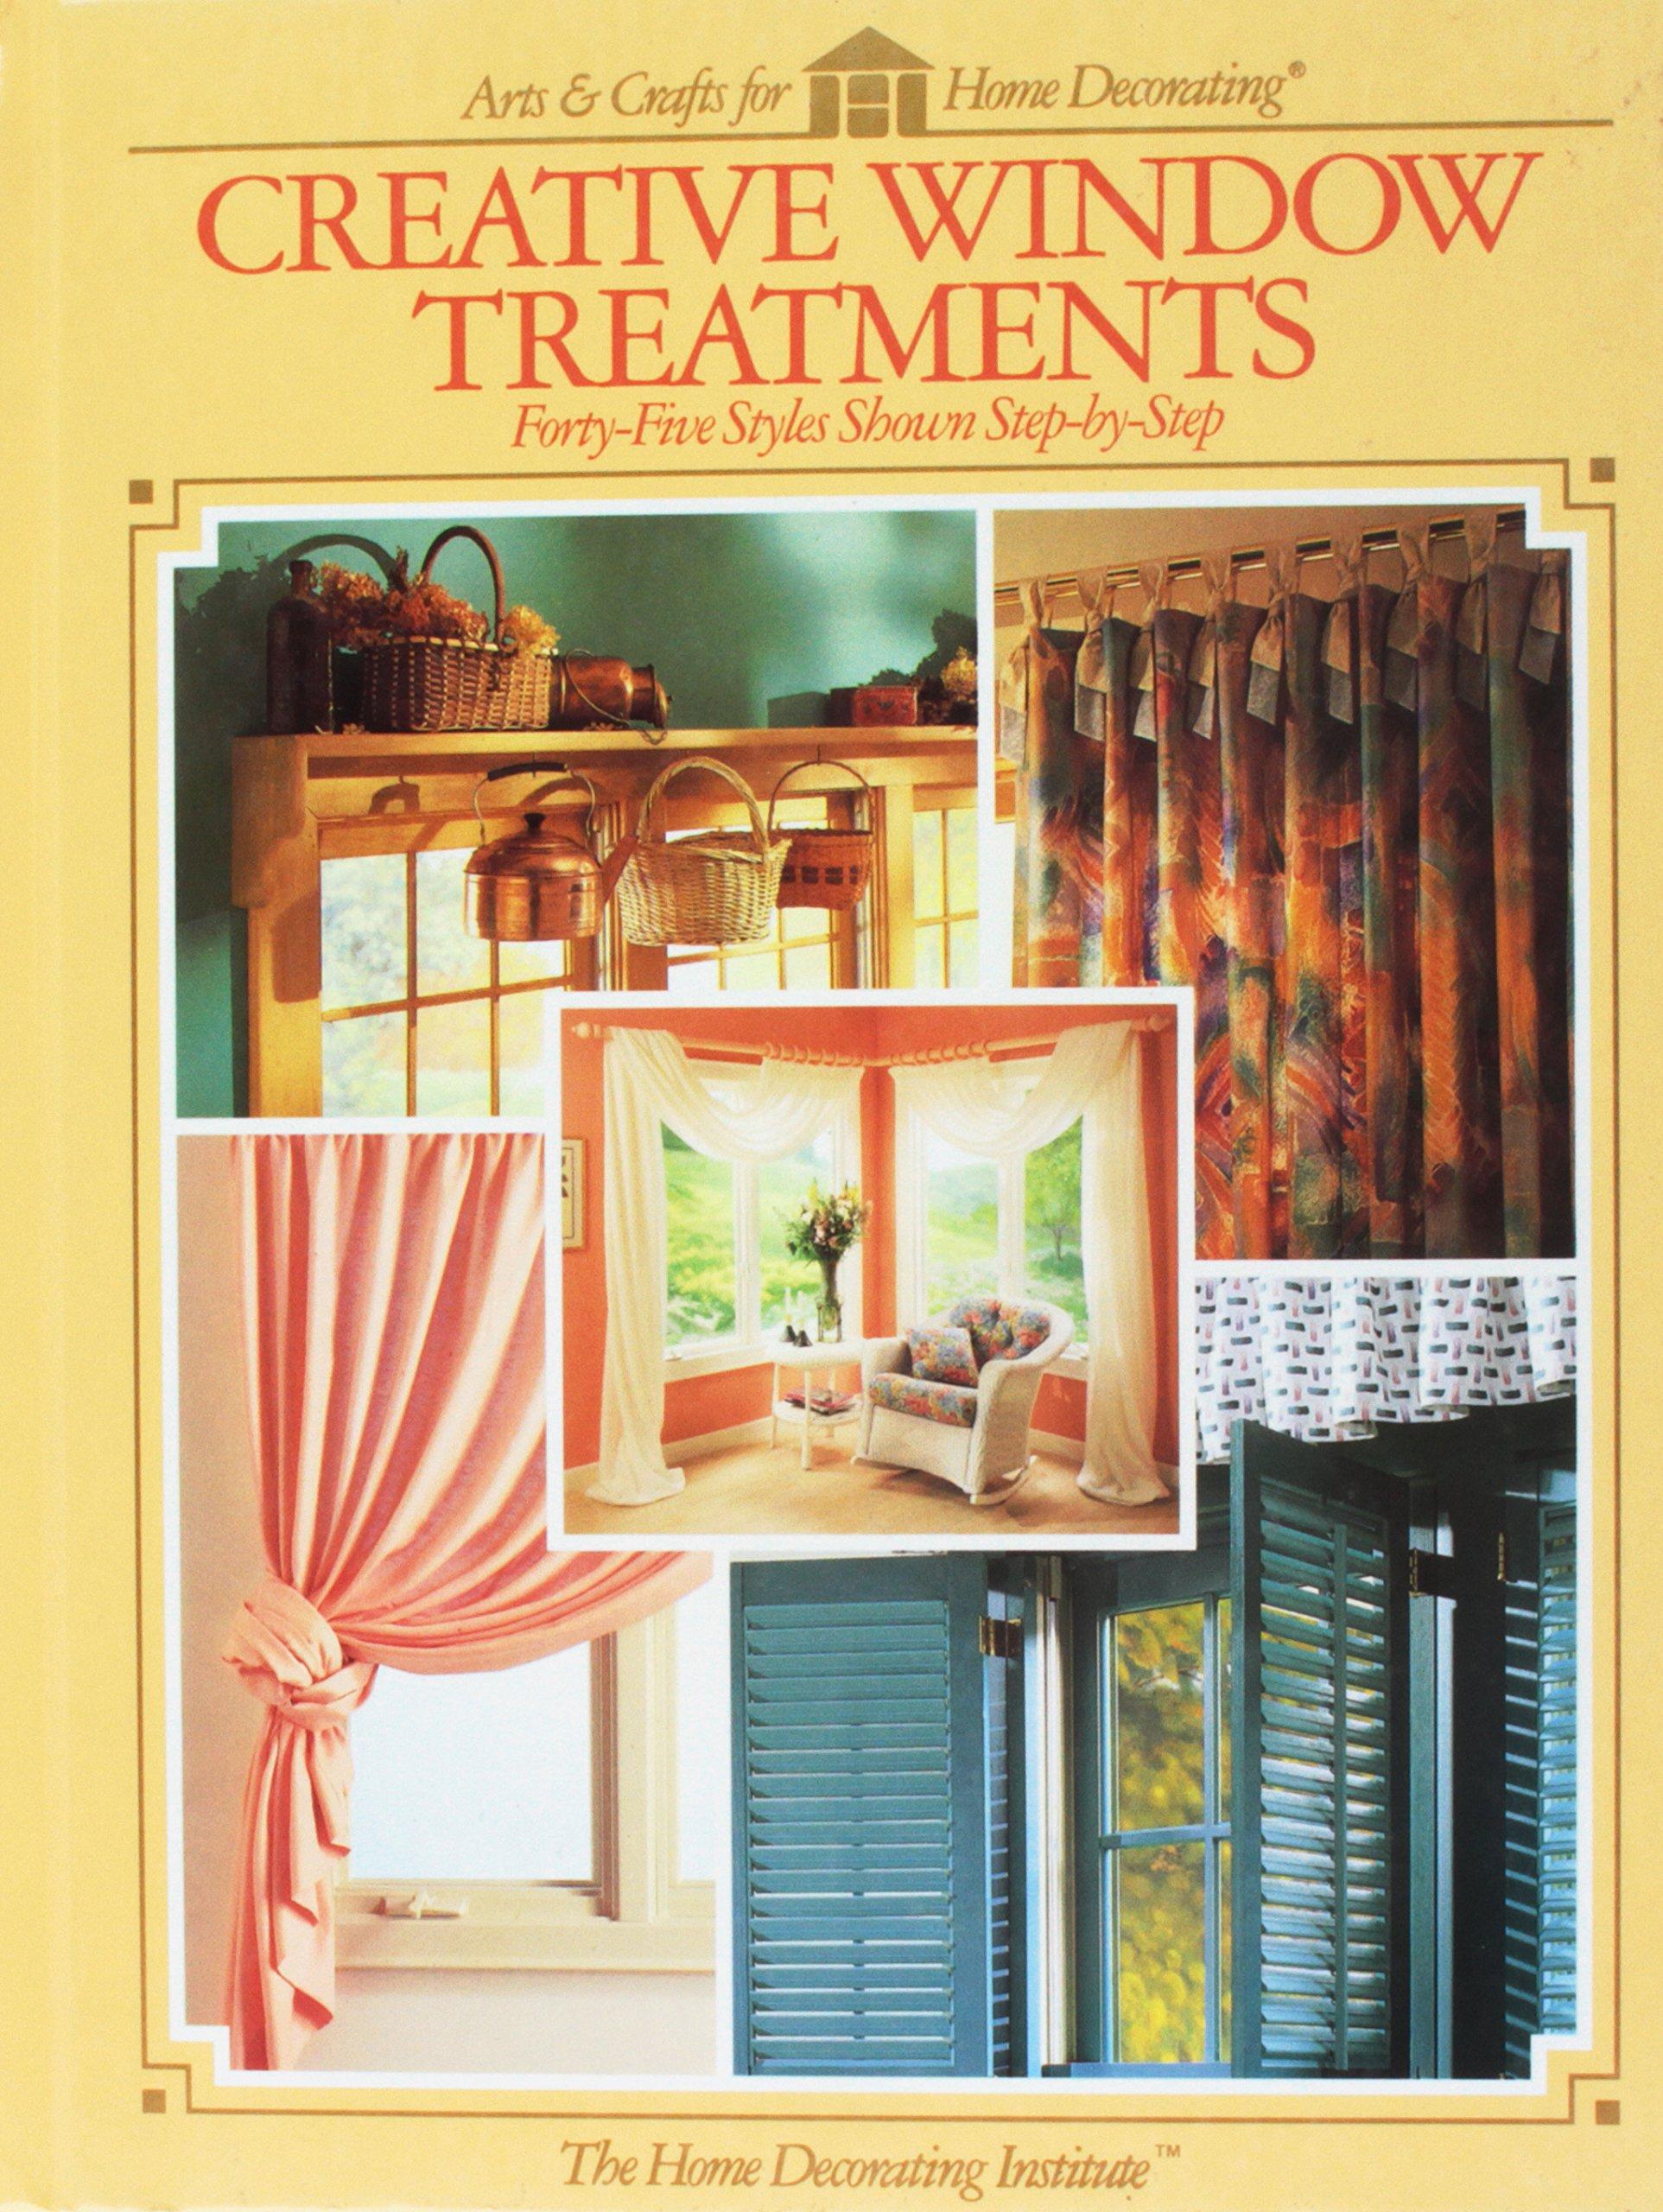 creative window treatments paper creative window treatments fortyfive styles shown stepbystep 9780865733527 amazoncom books stepbystep